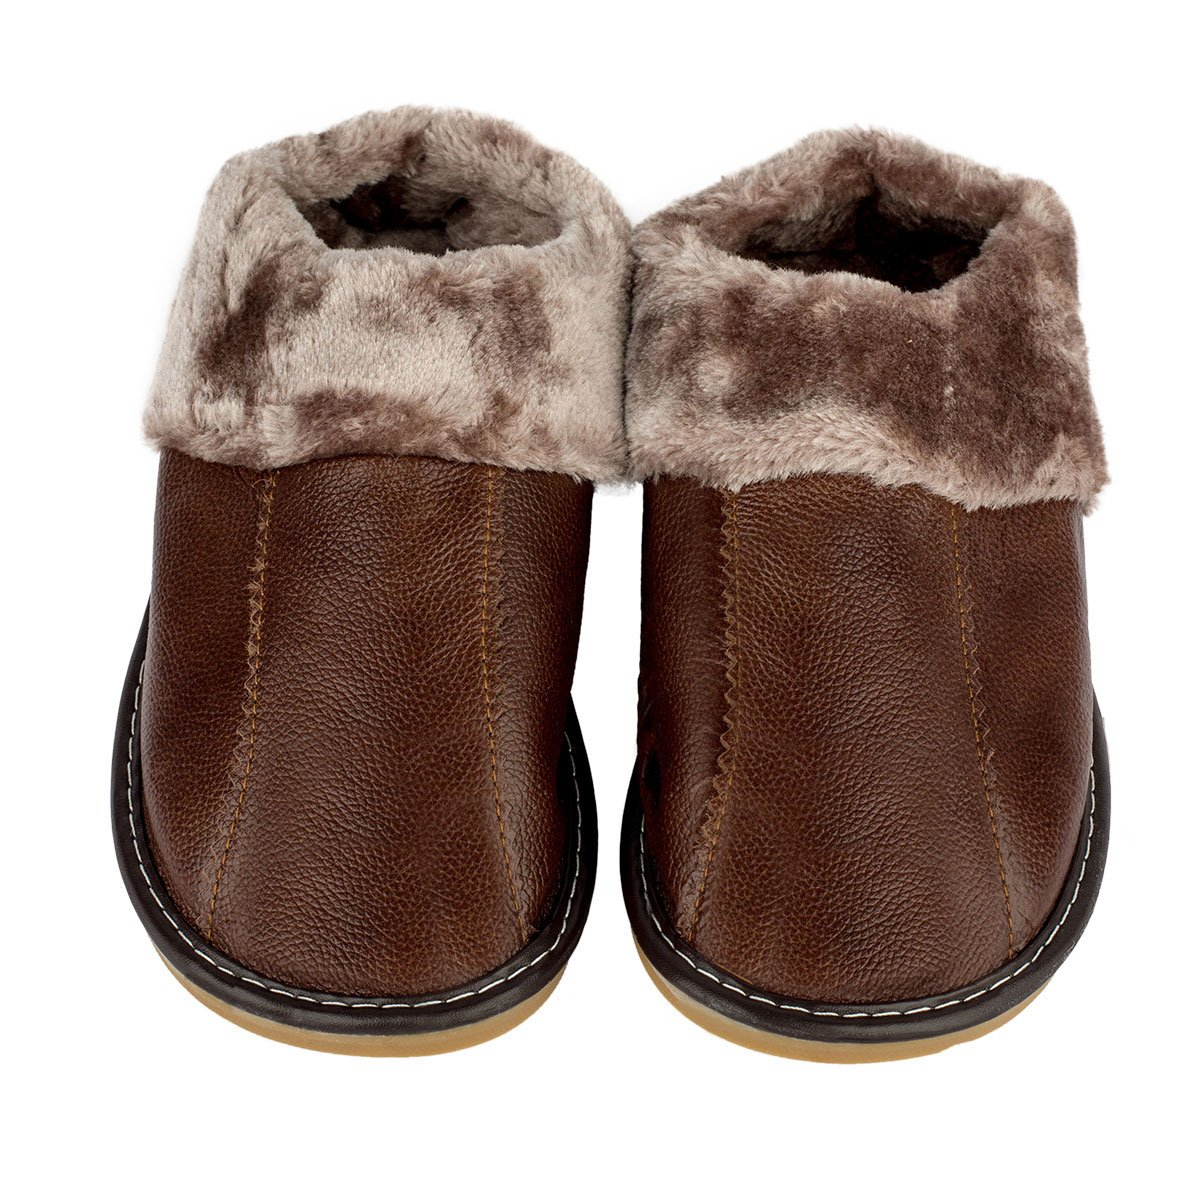 Haisum Men Comfortable Leather Slippers Plush Lining Slip-On House Shoes Non-Slip Bedroom Slippers